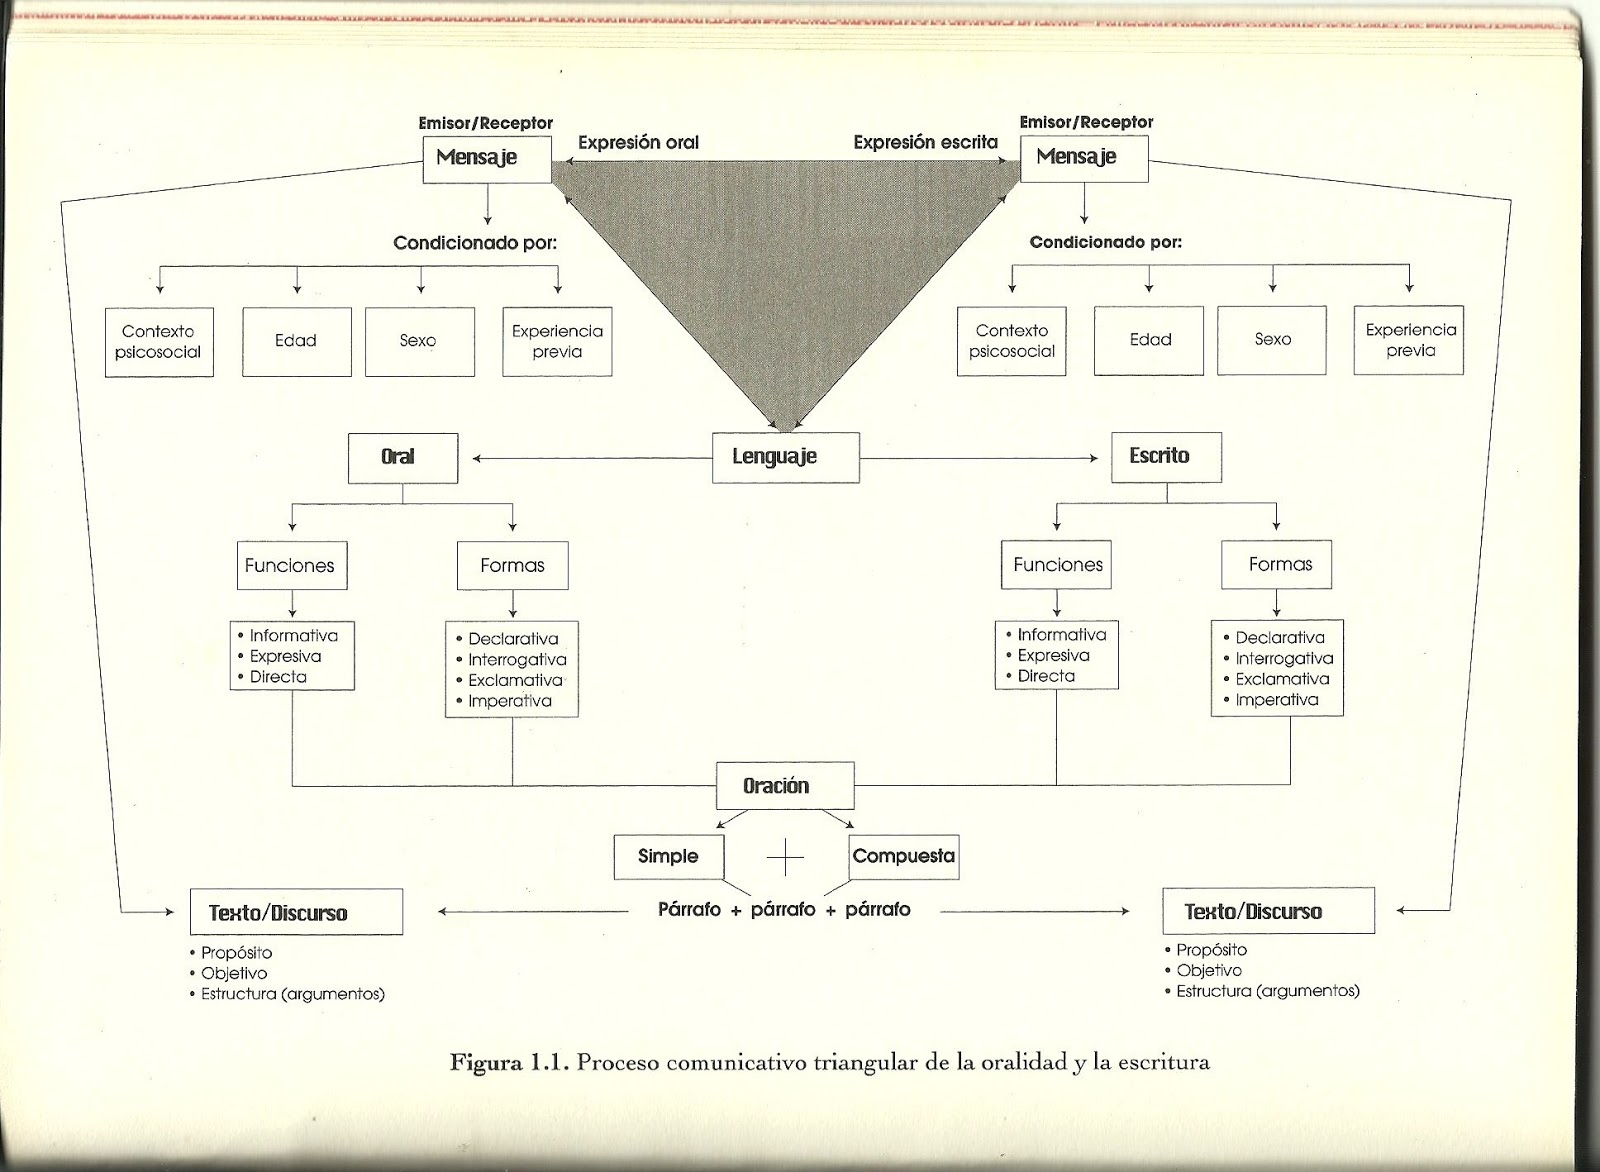 Circuito Comunicativo : Educación sin fronteras: proceso comunicativo triangular de la